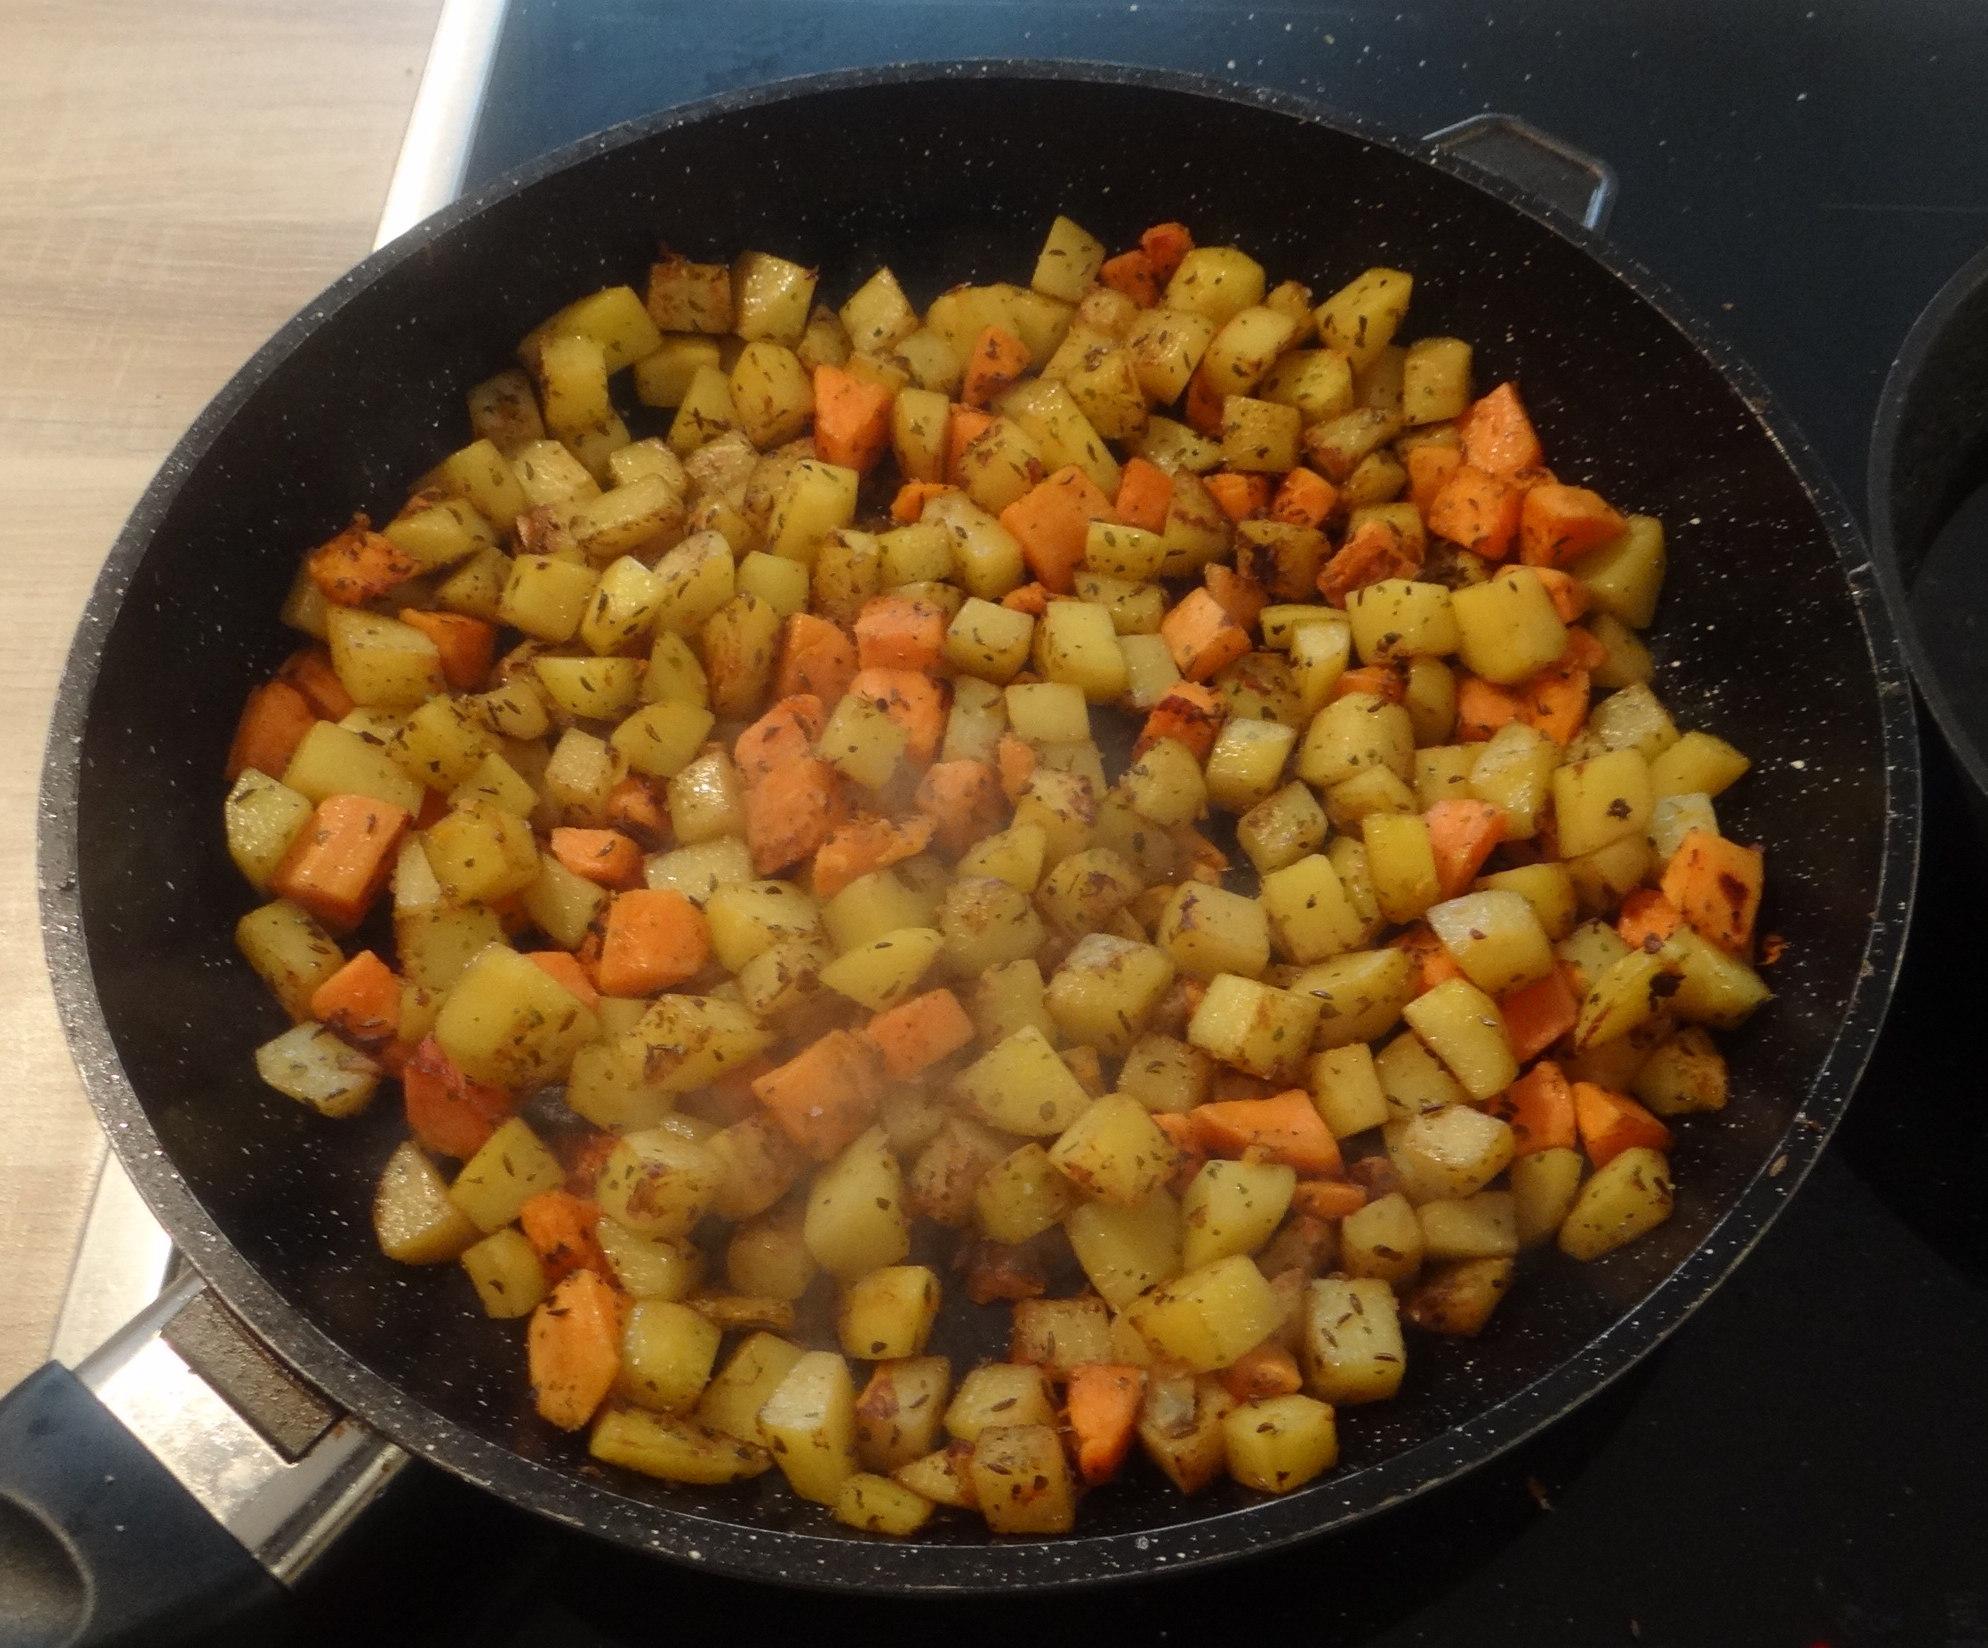 Rohgebratene Kartoffeln,Hackbällchen,Dip,Feldsalat (7)